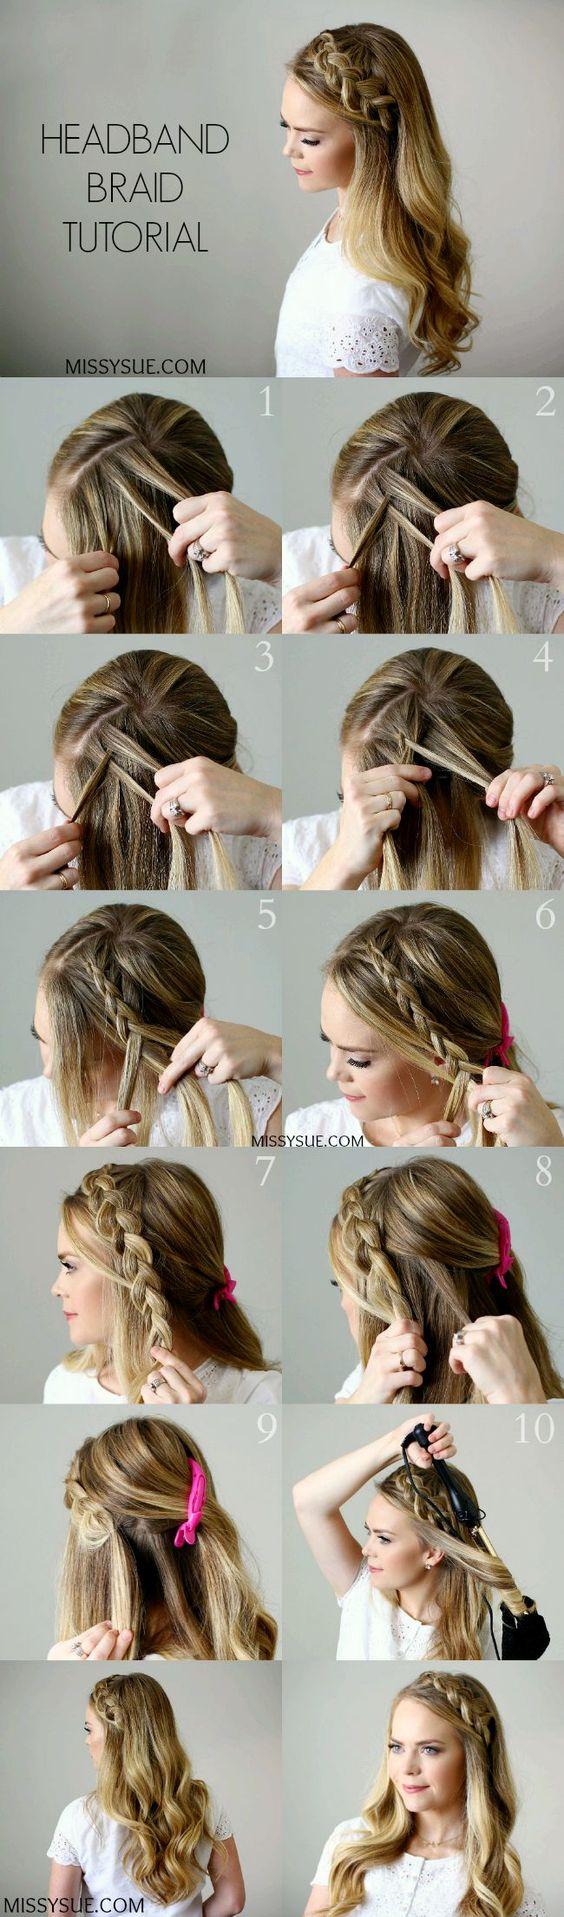 Tutorial Peinado trenza cabello suelto